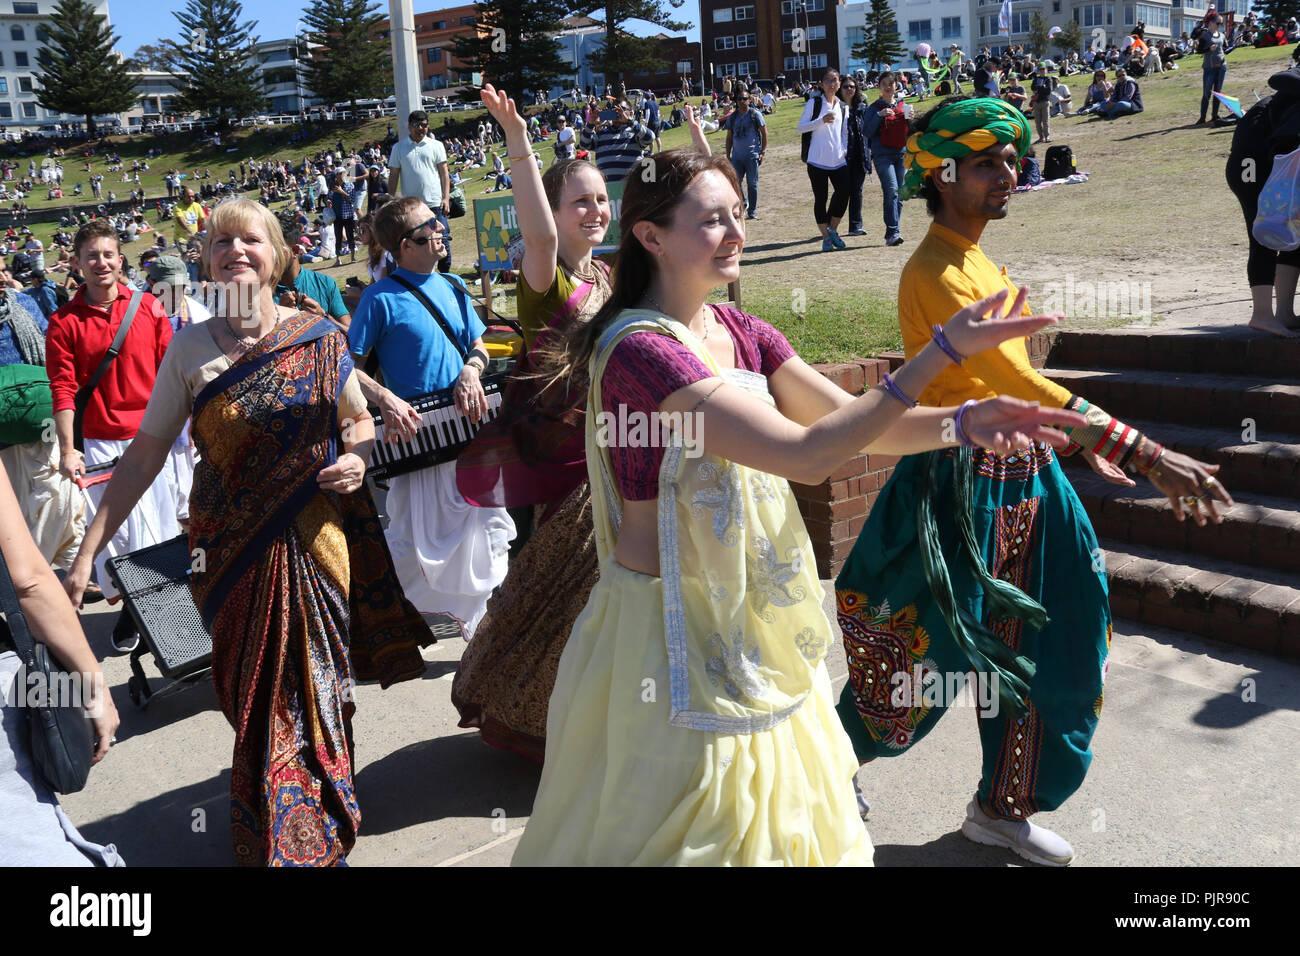 Hare Krishna followers at Bondi Beach, Sydney, Australia Stock Photo